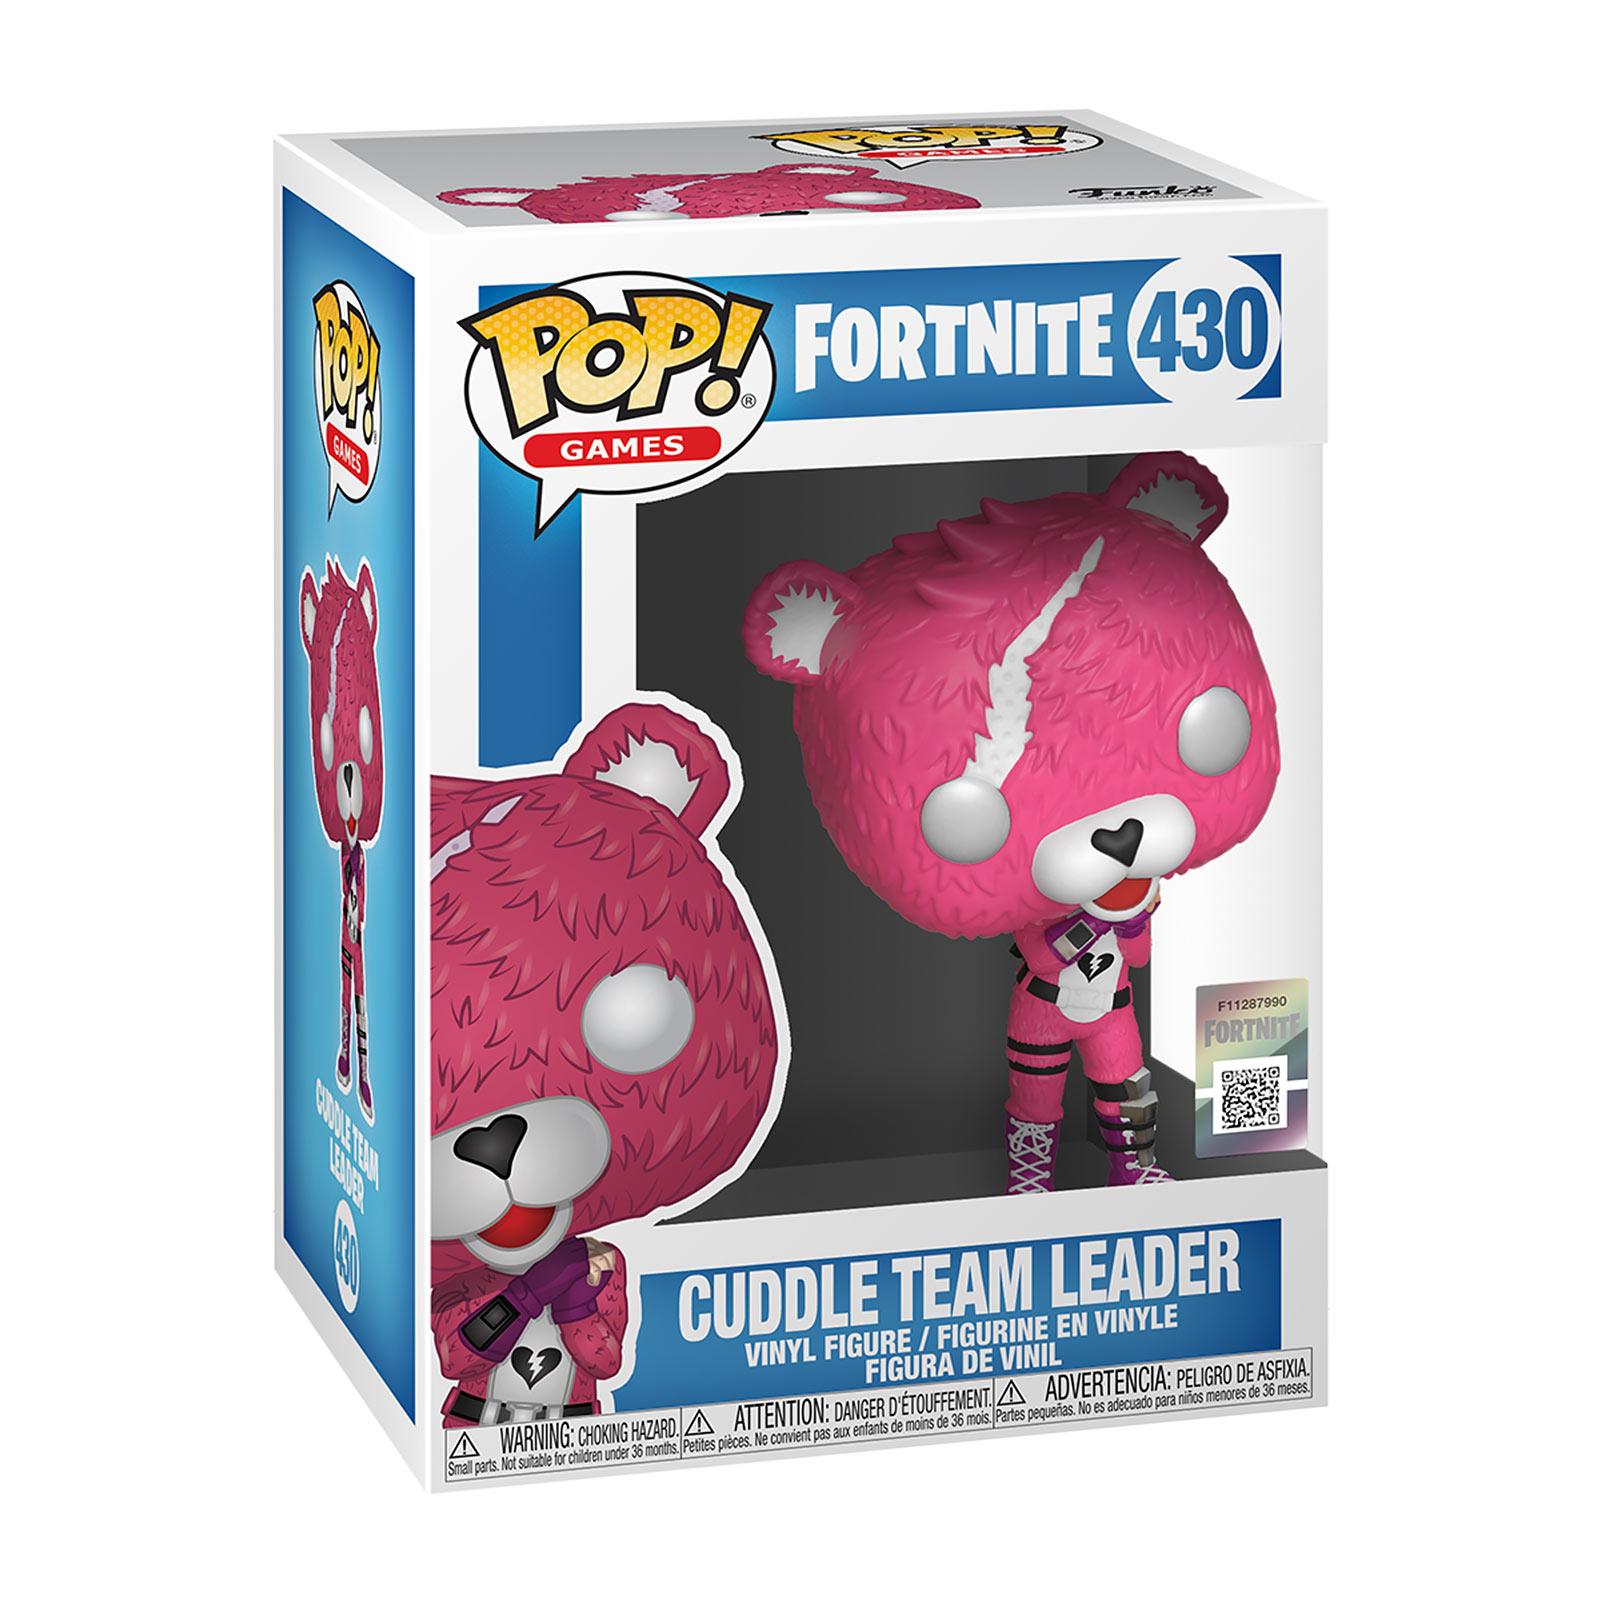 Fortnite - Cuddle Team Leader Funko Pop Figur